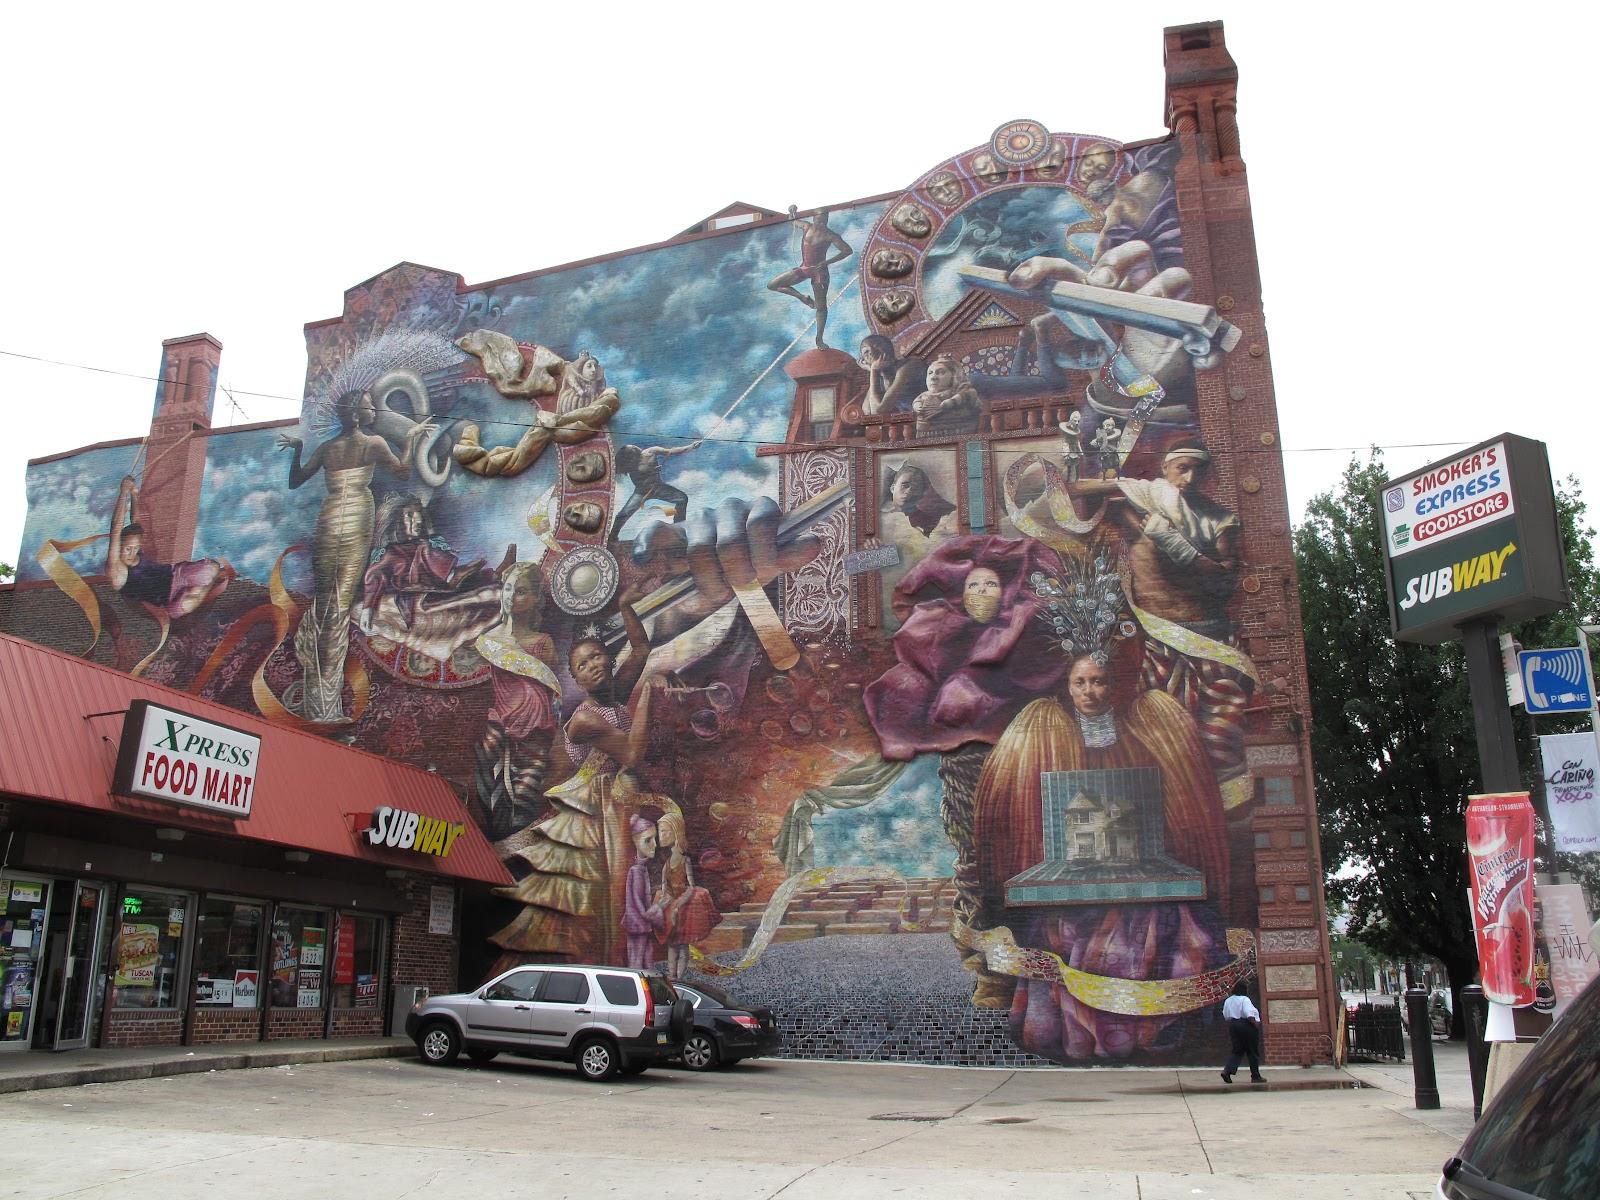 wonderful-of-philadelphia-mural-arts-world-graffiti-murals-art.jpg